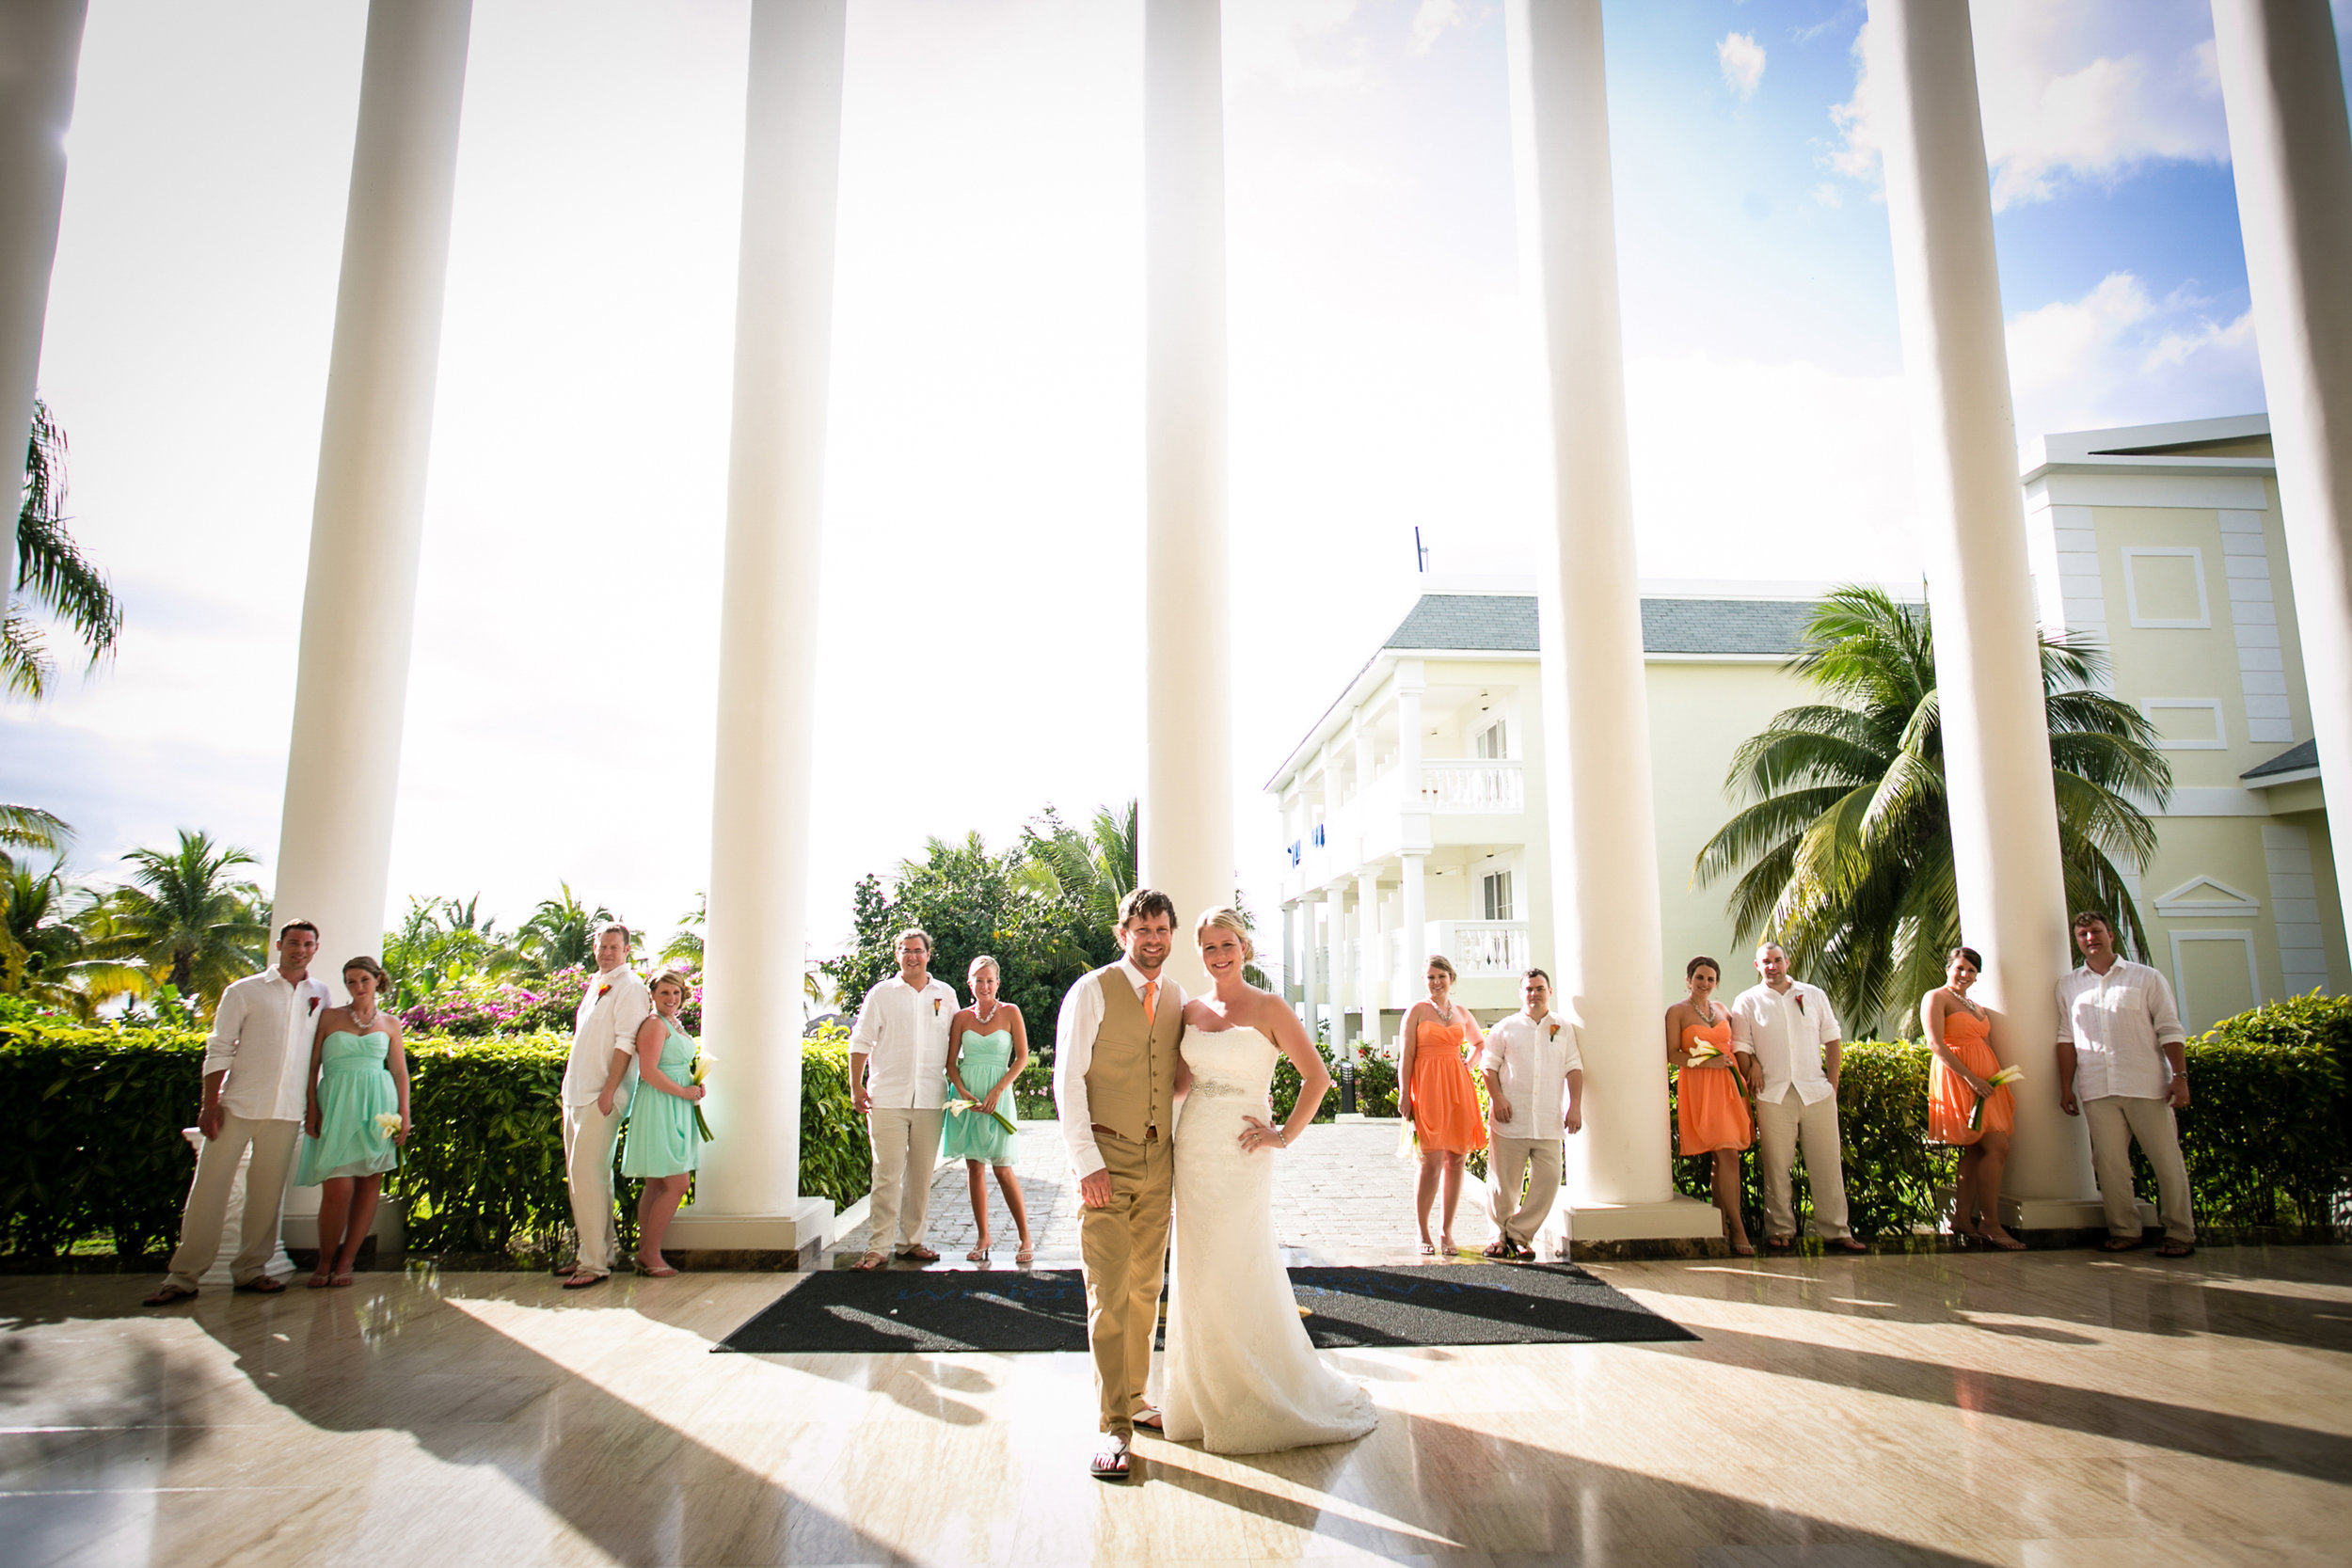 007-JAMAICA-WEDDING-PHOTOGRAPHER.jpg